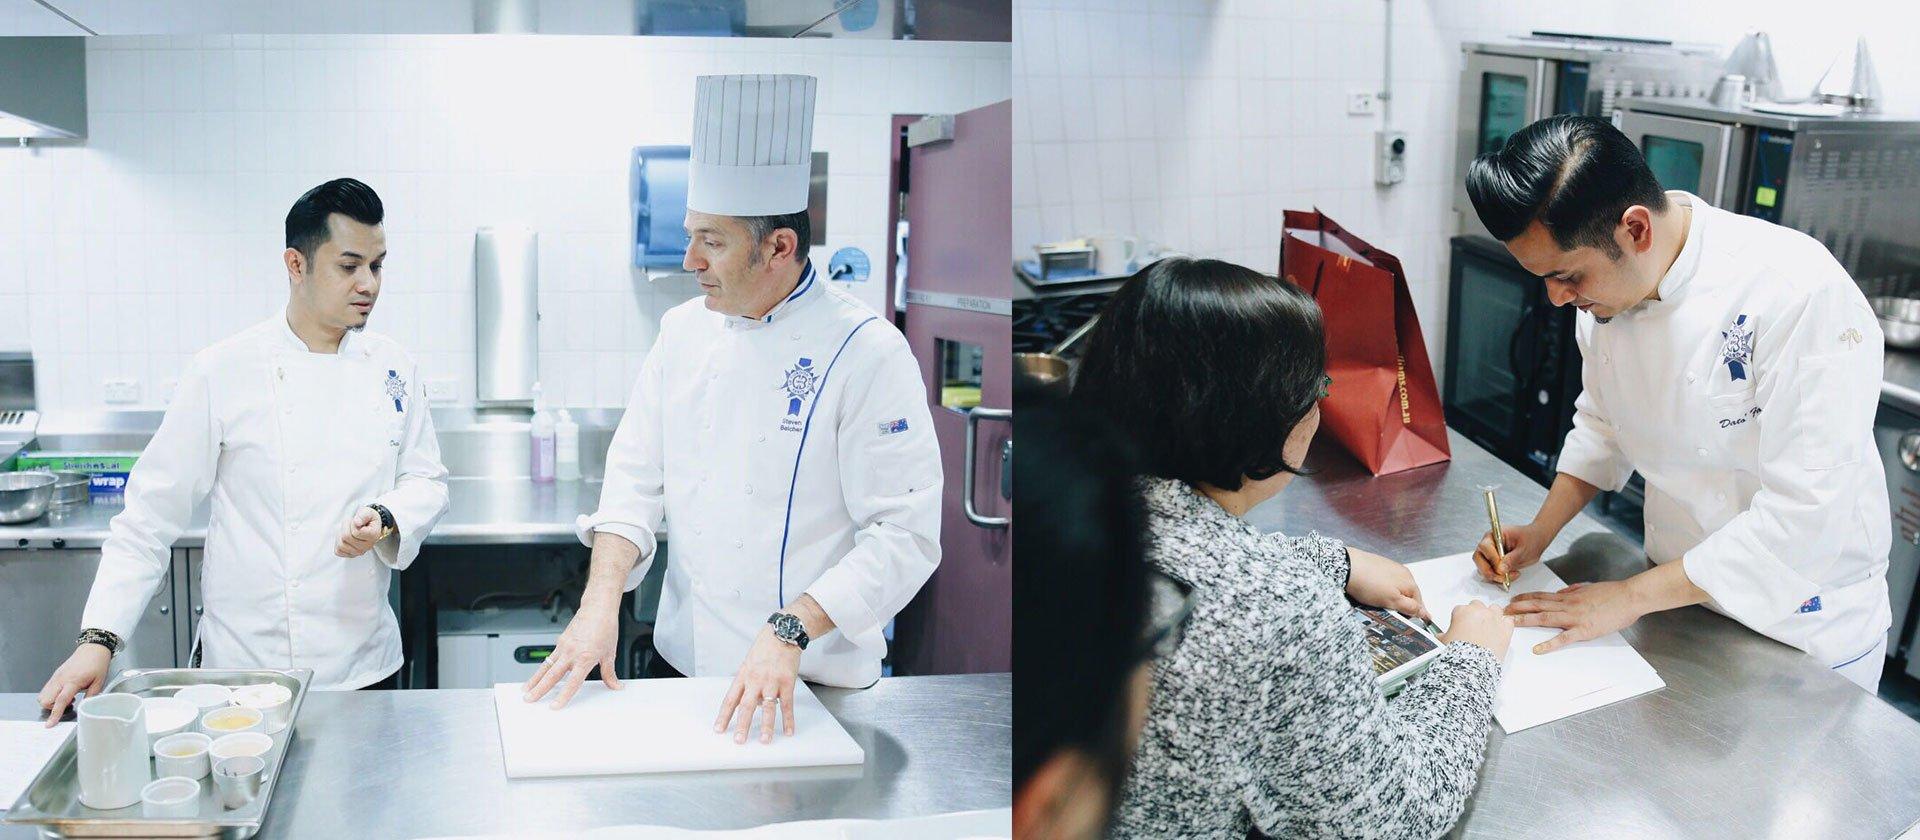 Le Cordon Bleu Celebrity Alumni Dato' Fazley Yaakob conducts a grand performance in cooking & singing